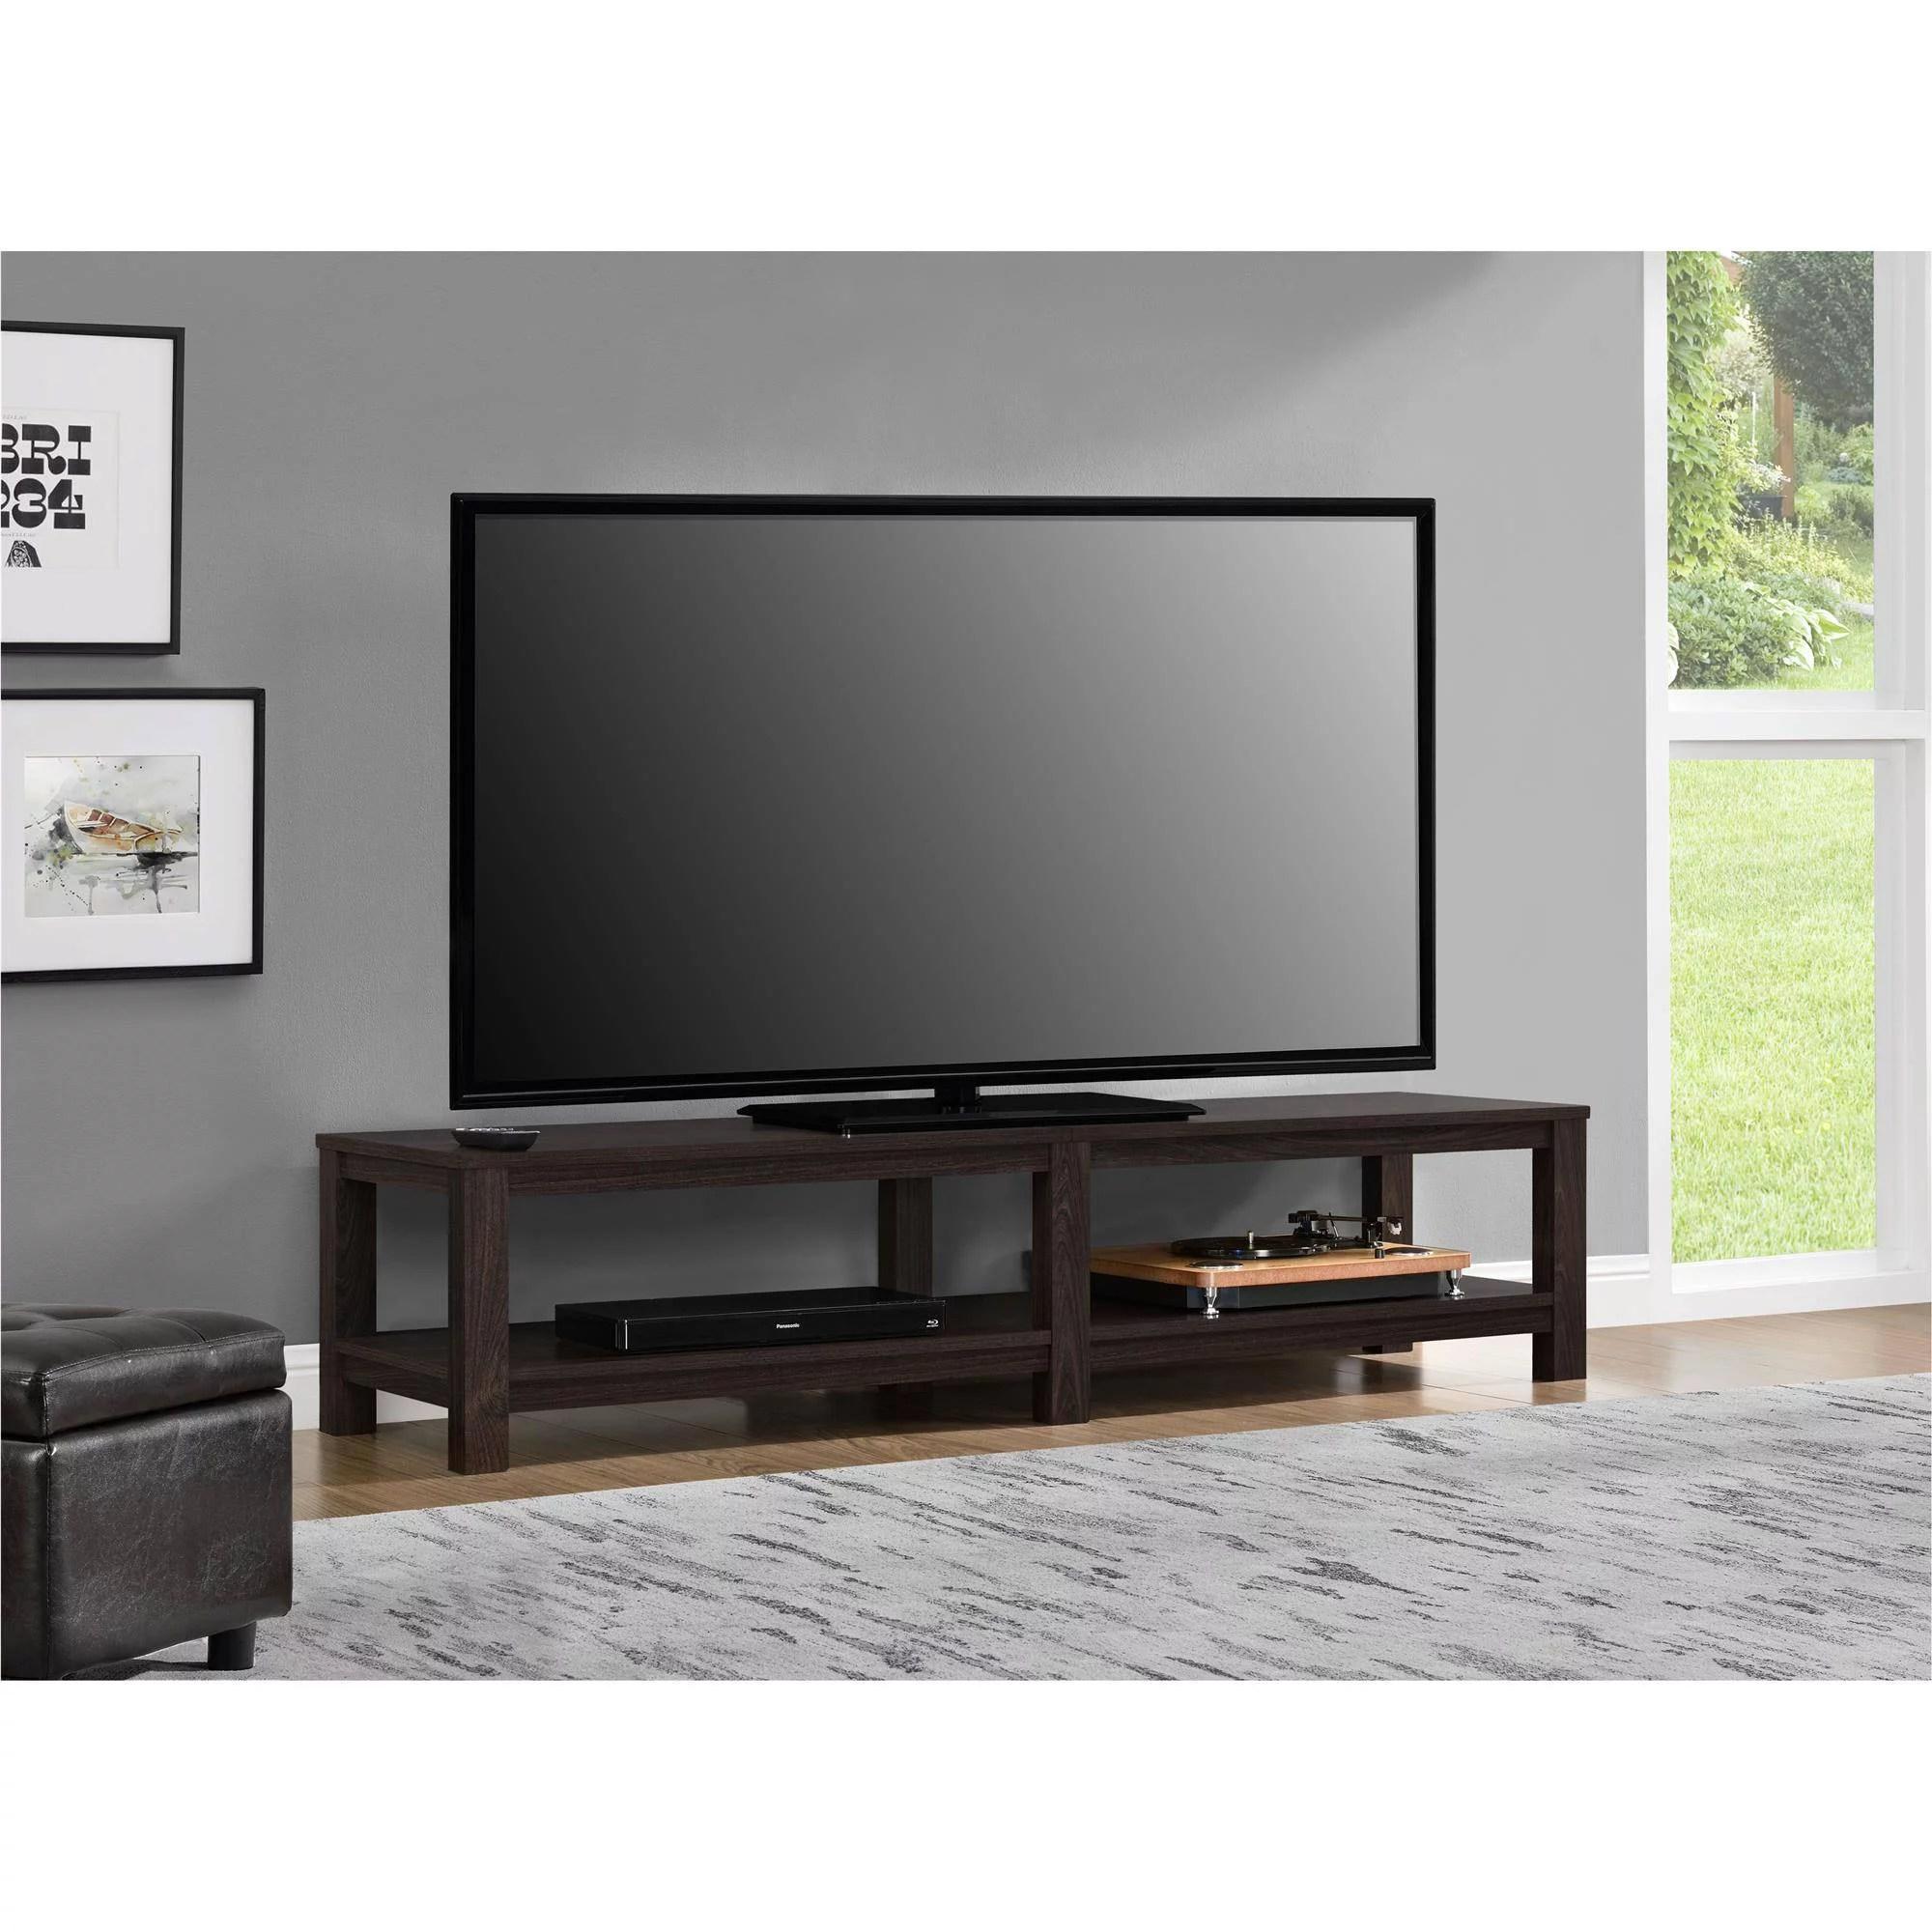 65 in TV Stands for Flat Screen TV Walmart